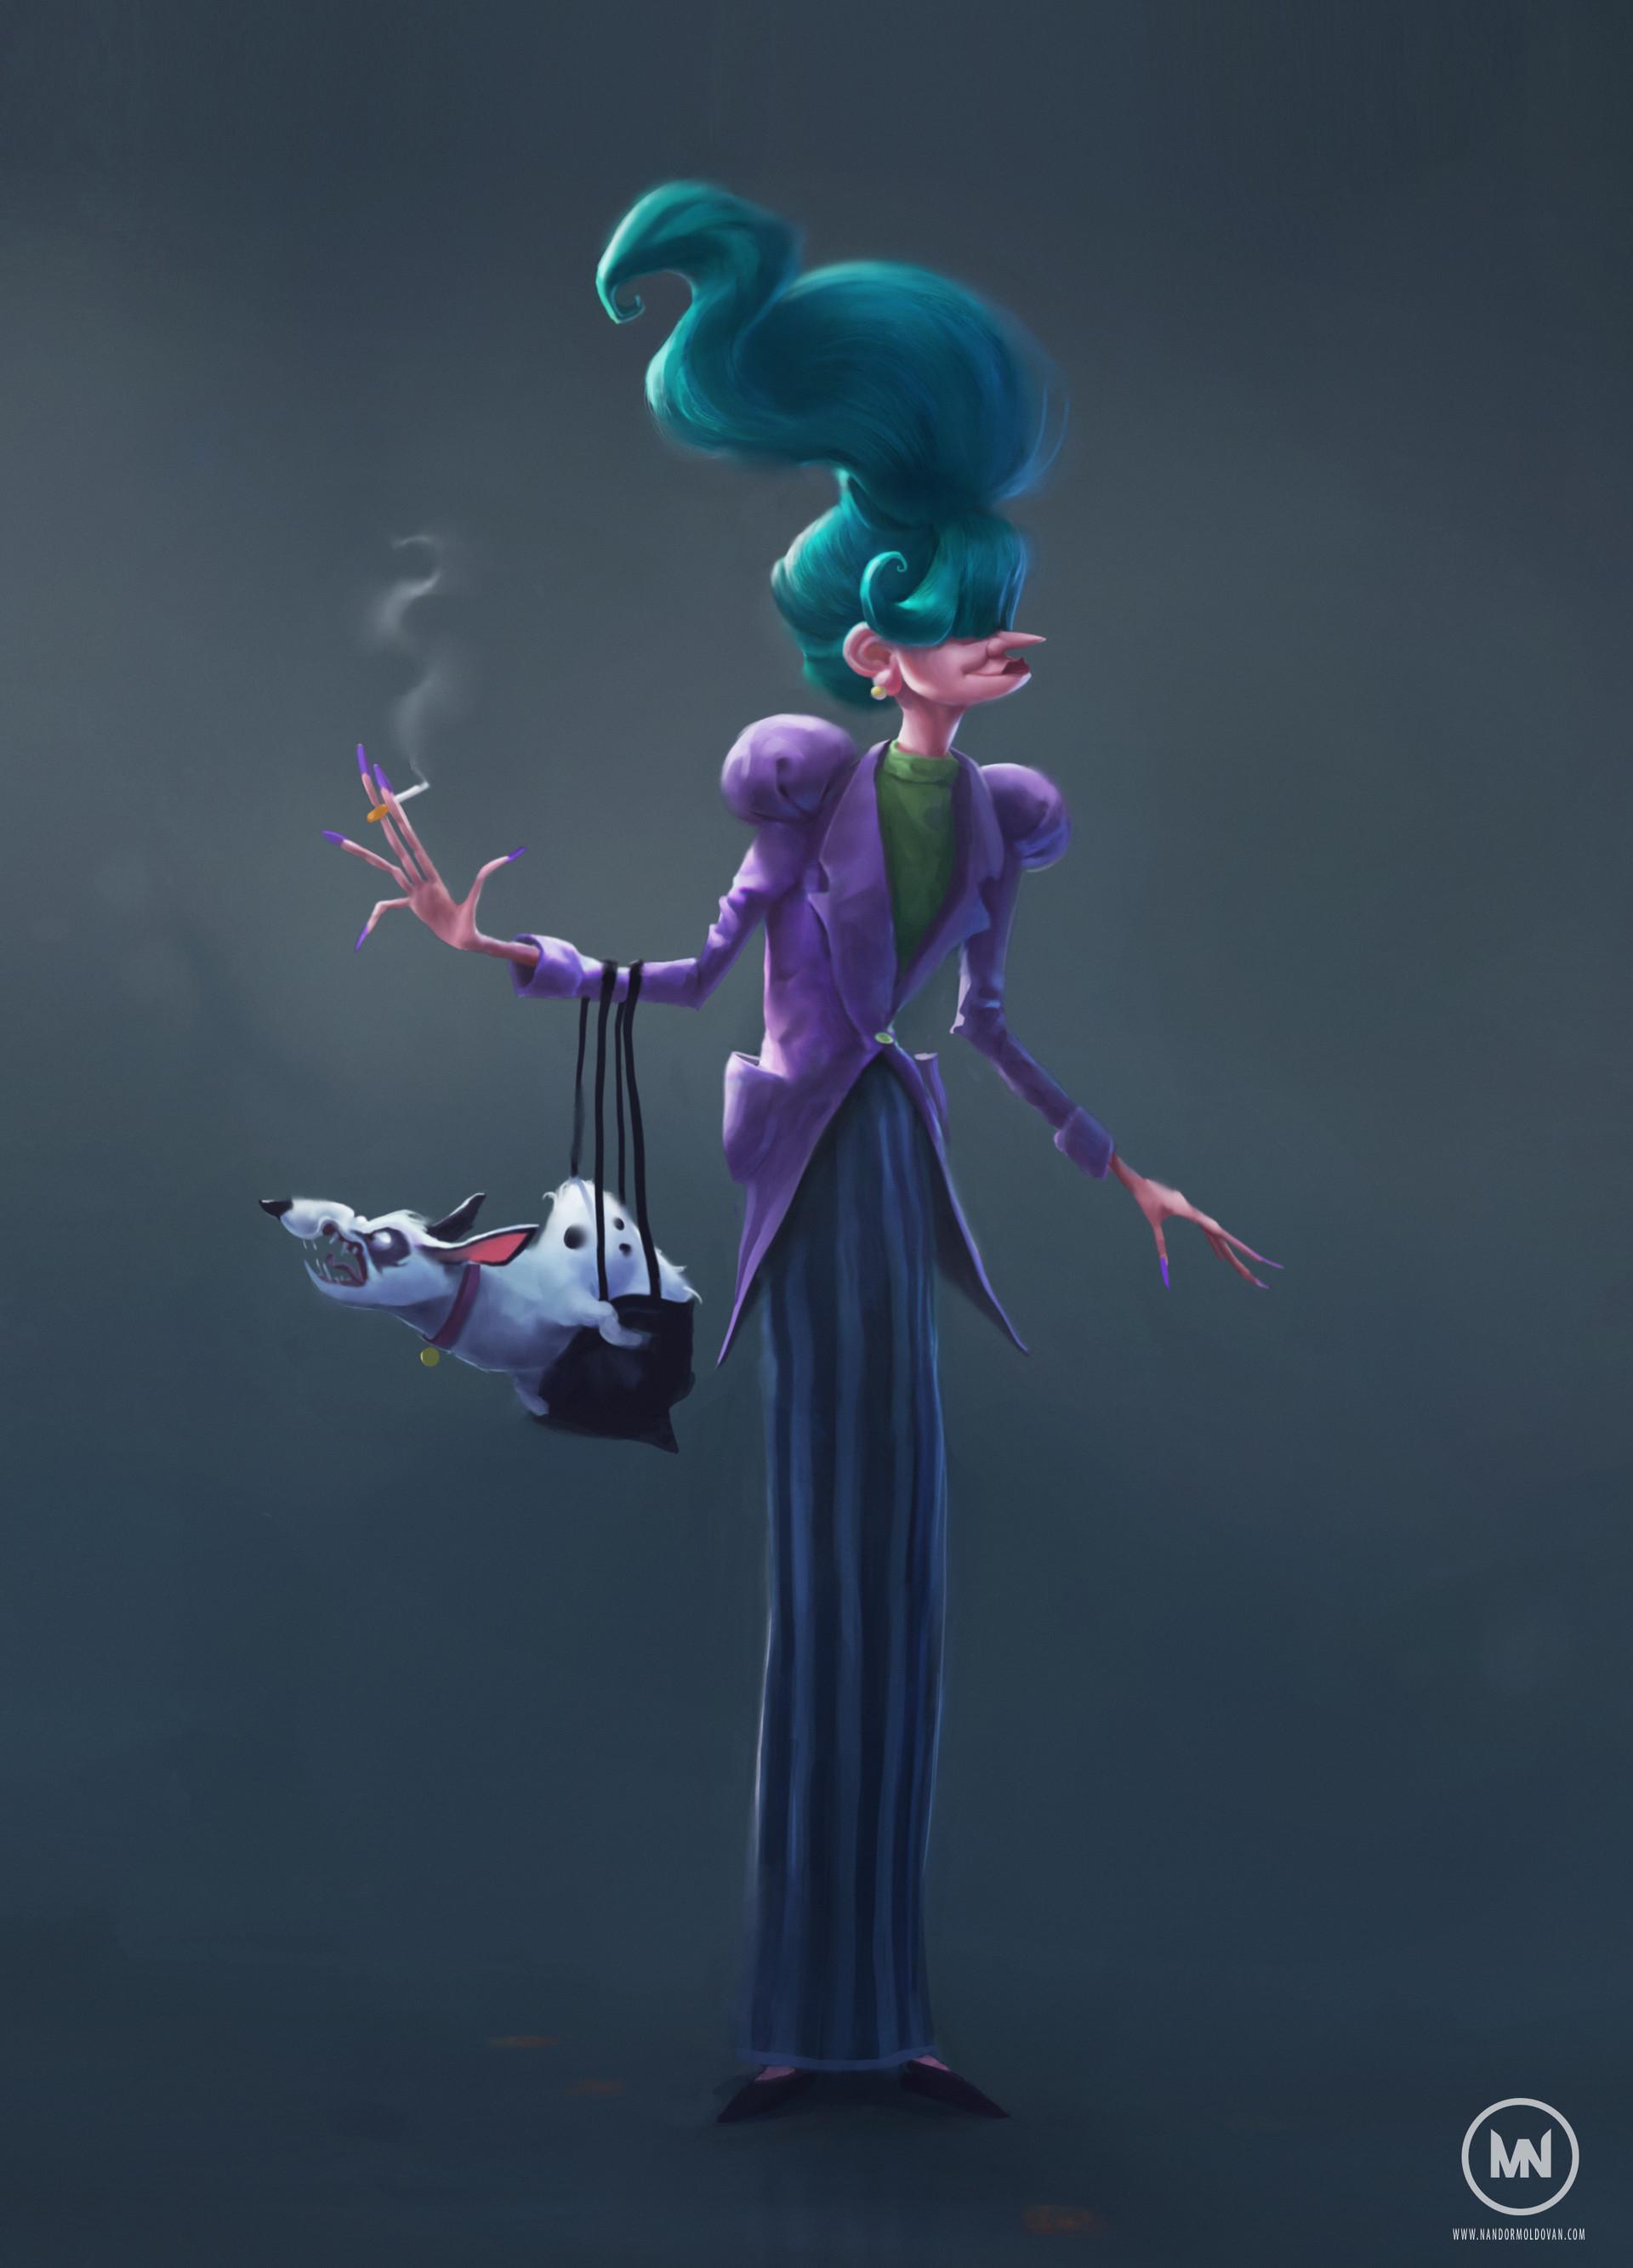 Nandor moldovan eccentric lady character design nandor moldovan